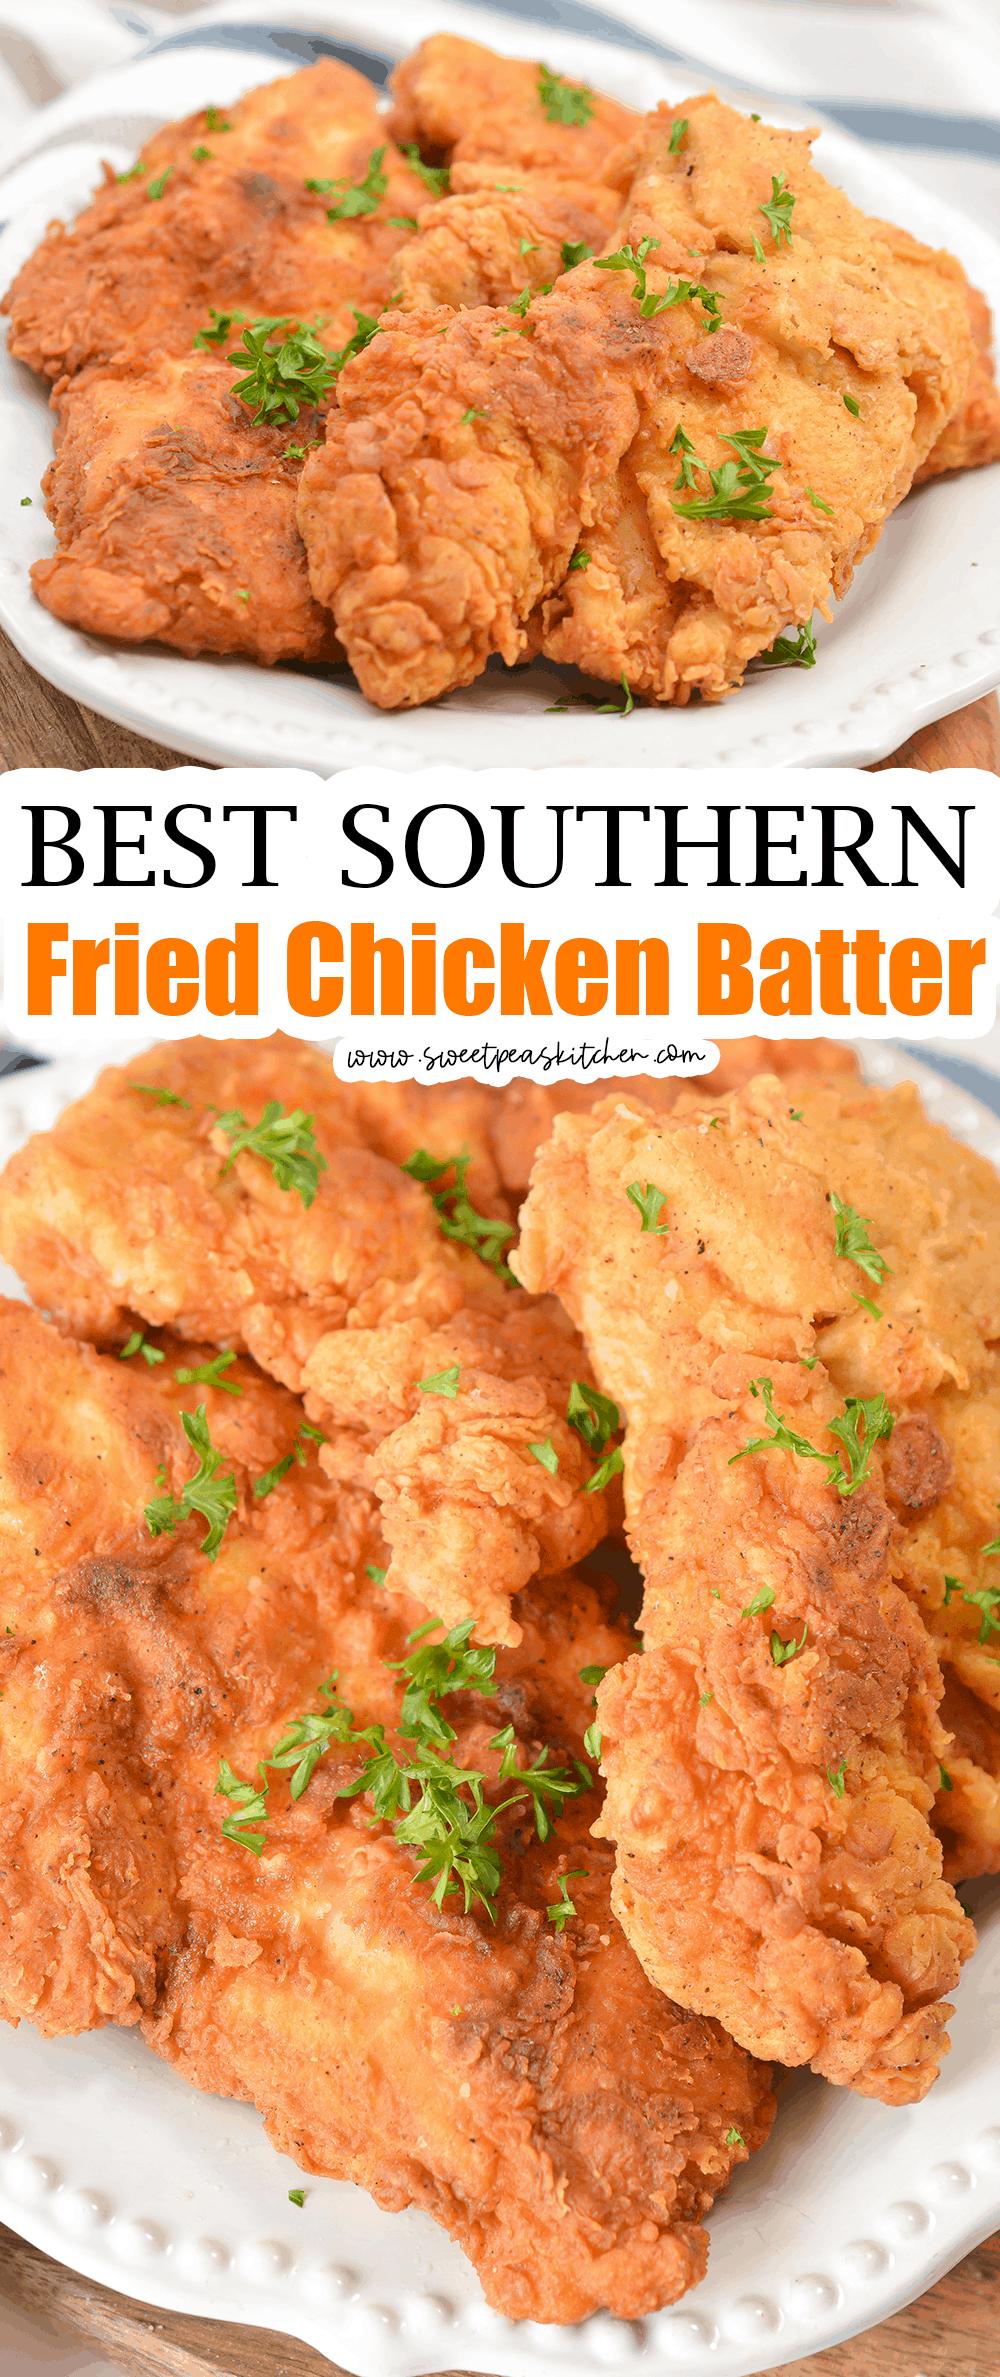 Best Southern Fried Chicken Batter